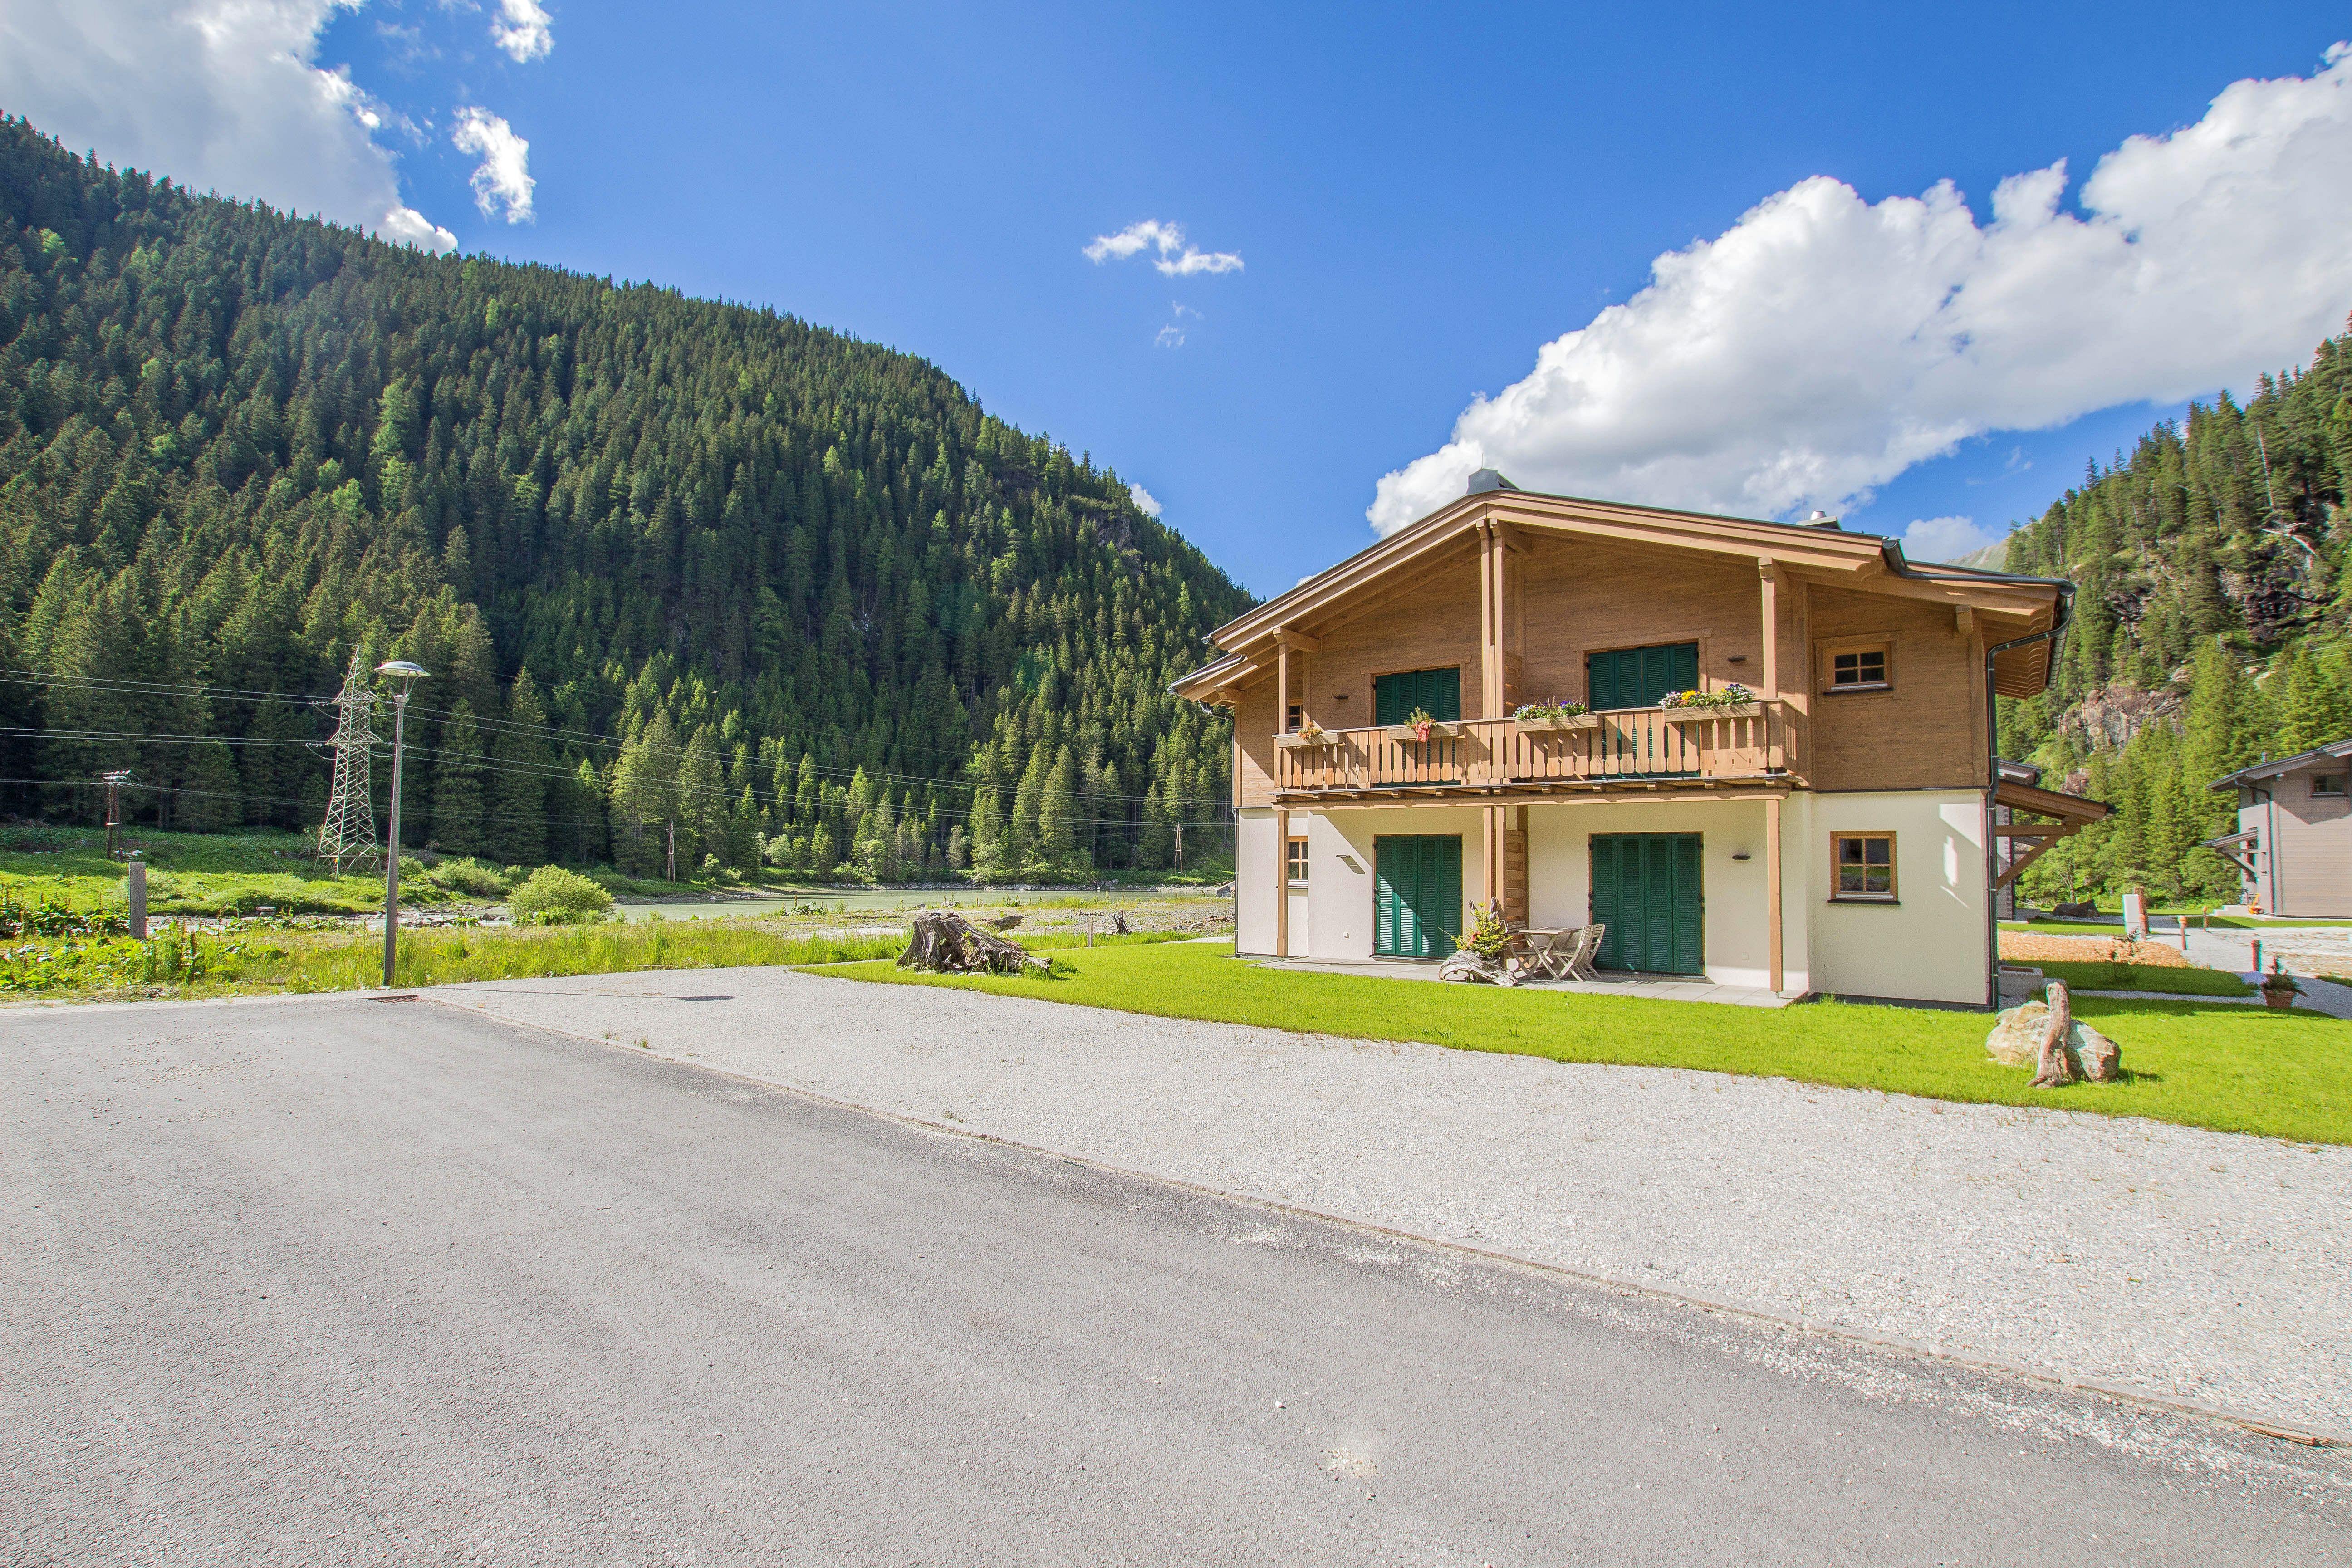 Maison de vacances Lodge Adlerhorst direkt am Skilift (2050393), Uttendorf, Pinzgau, Salzbourg, Autriche, image 22